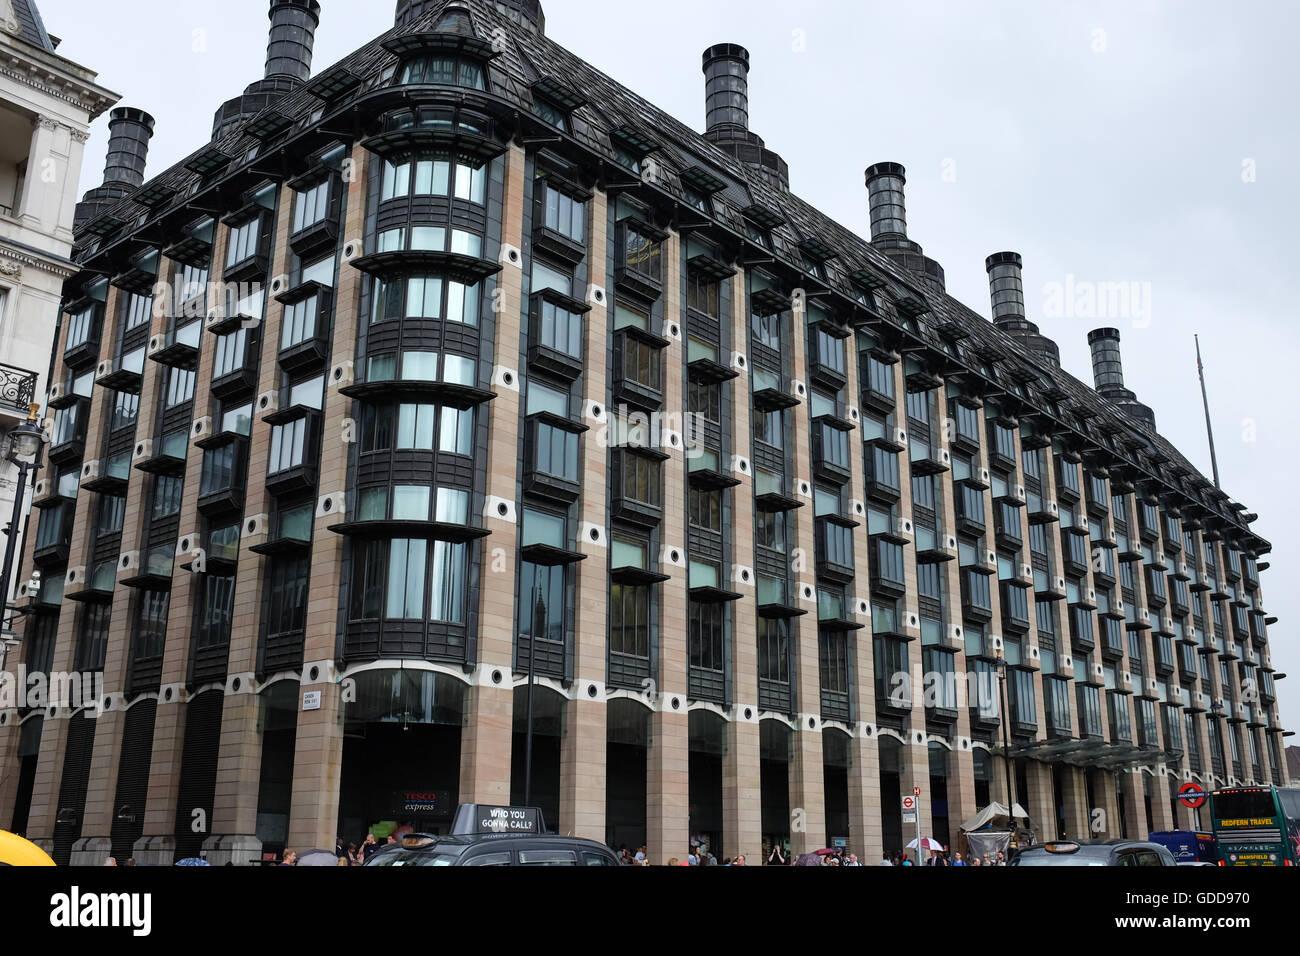 Portcullis House en Westminster, Londres, Inglaterra. Foto de stock